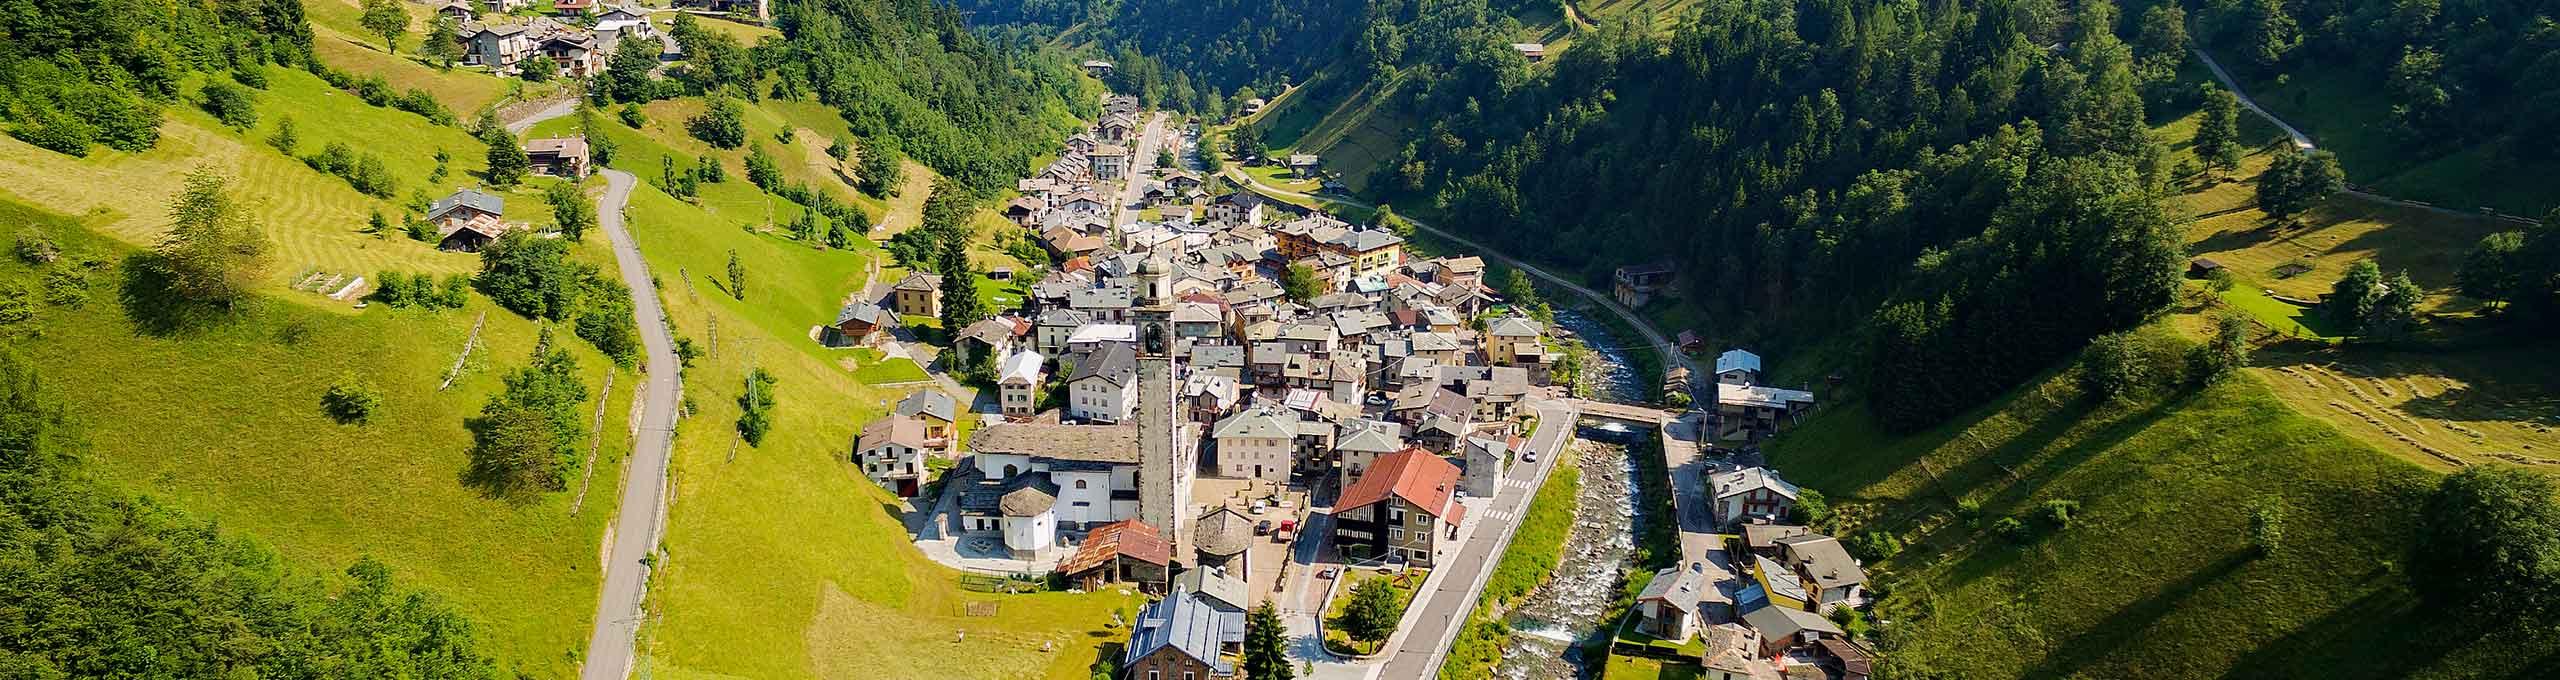 Gerola Alta, Valtellina